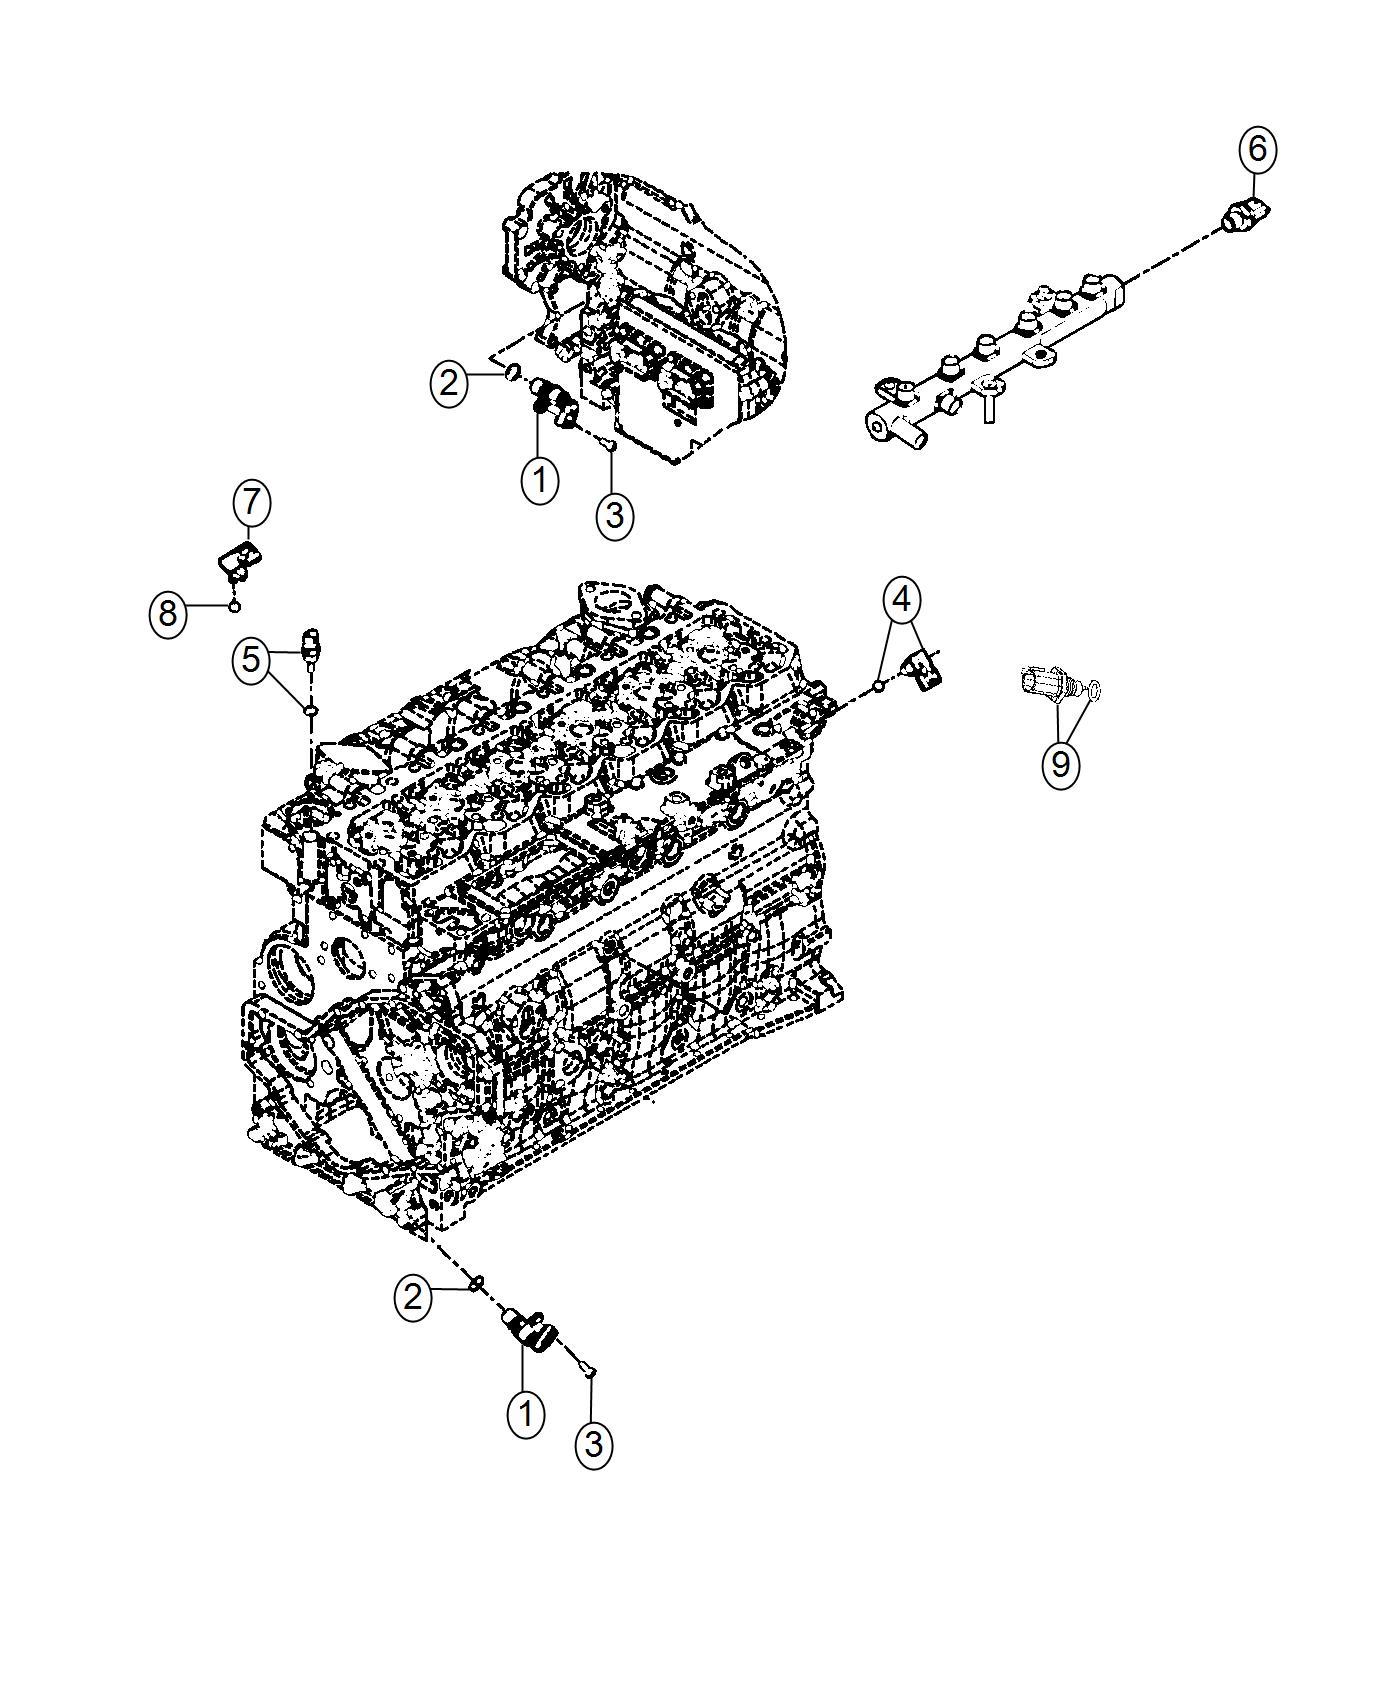 tags: #n14 cummins engine fuel lines diagram#cumminssel engine diagram#cummins  n14 accessory drive schematic#cummins n14 ecm wiring harness#n14 cummins